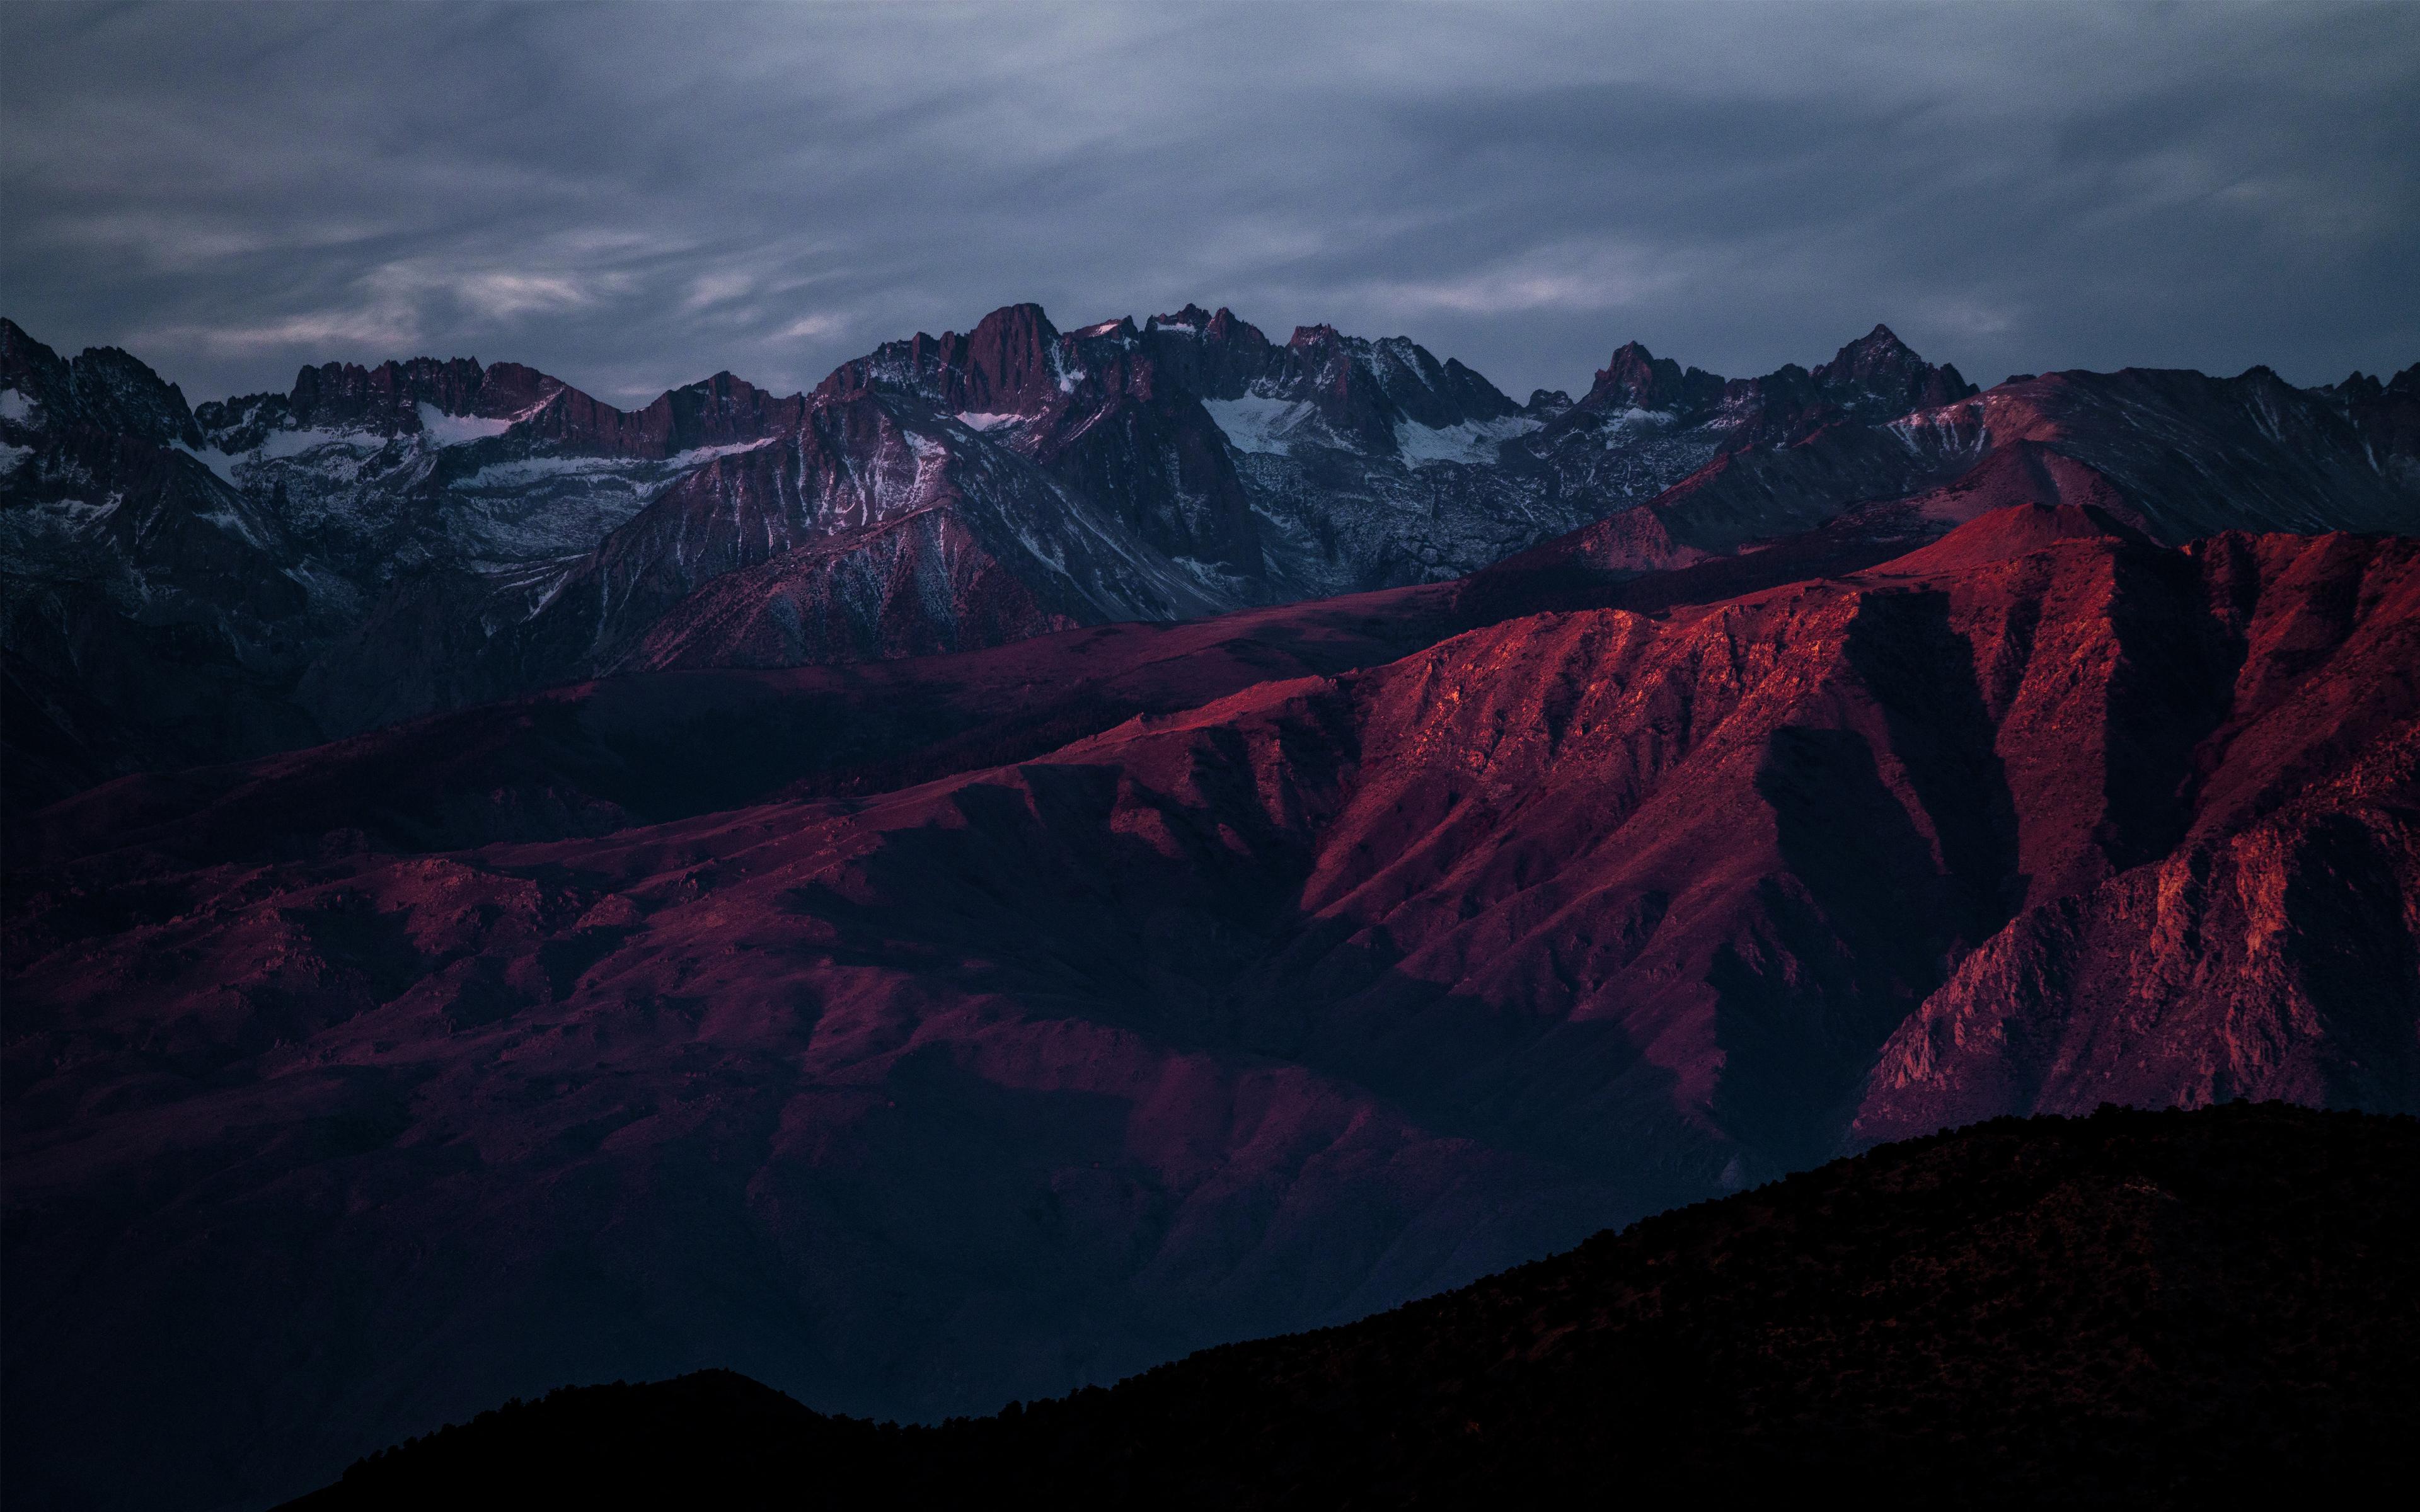 Mountains after Sunset 4K 8K Wallpaper